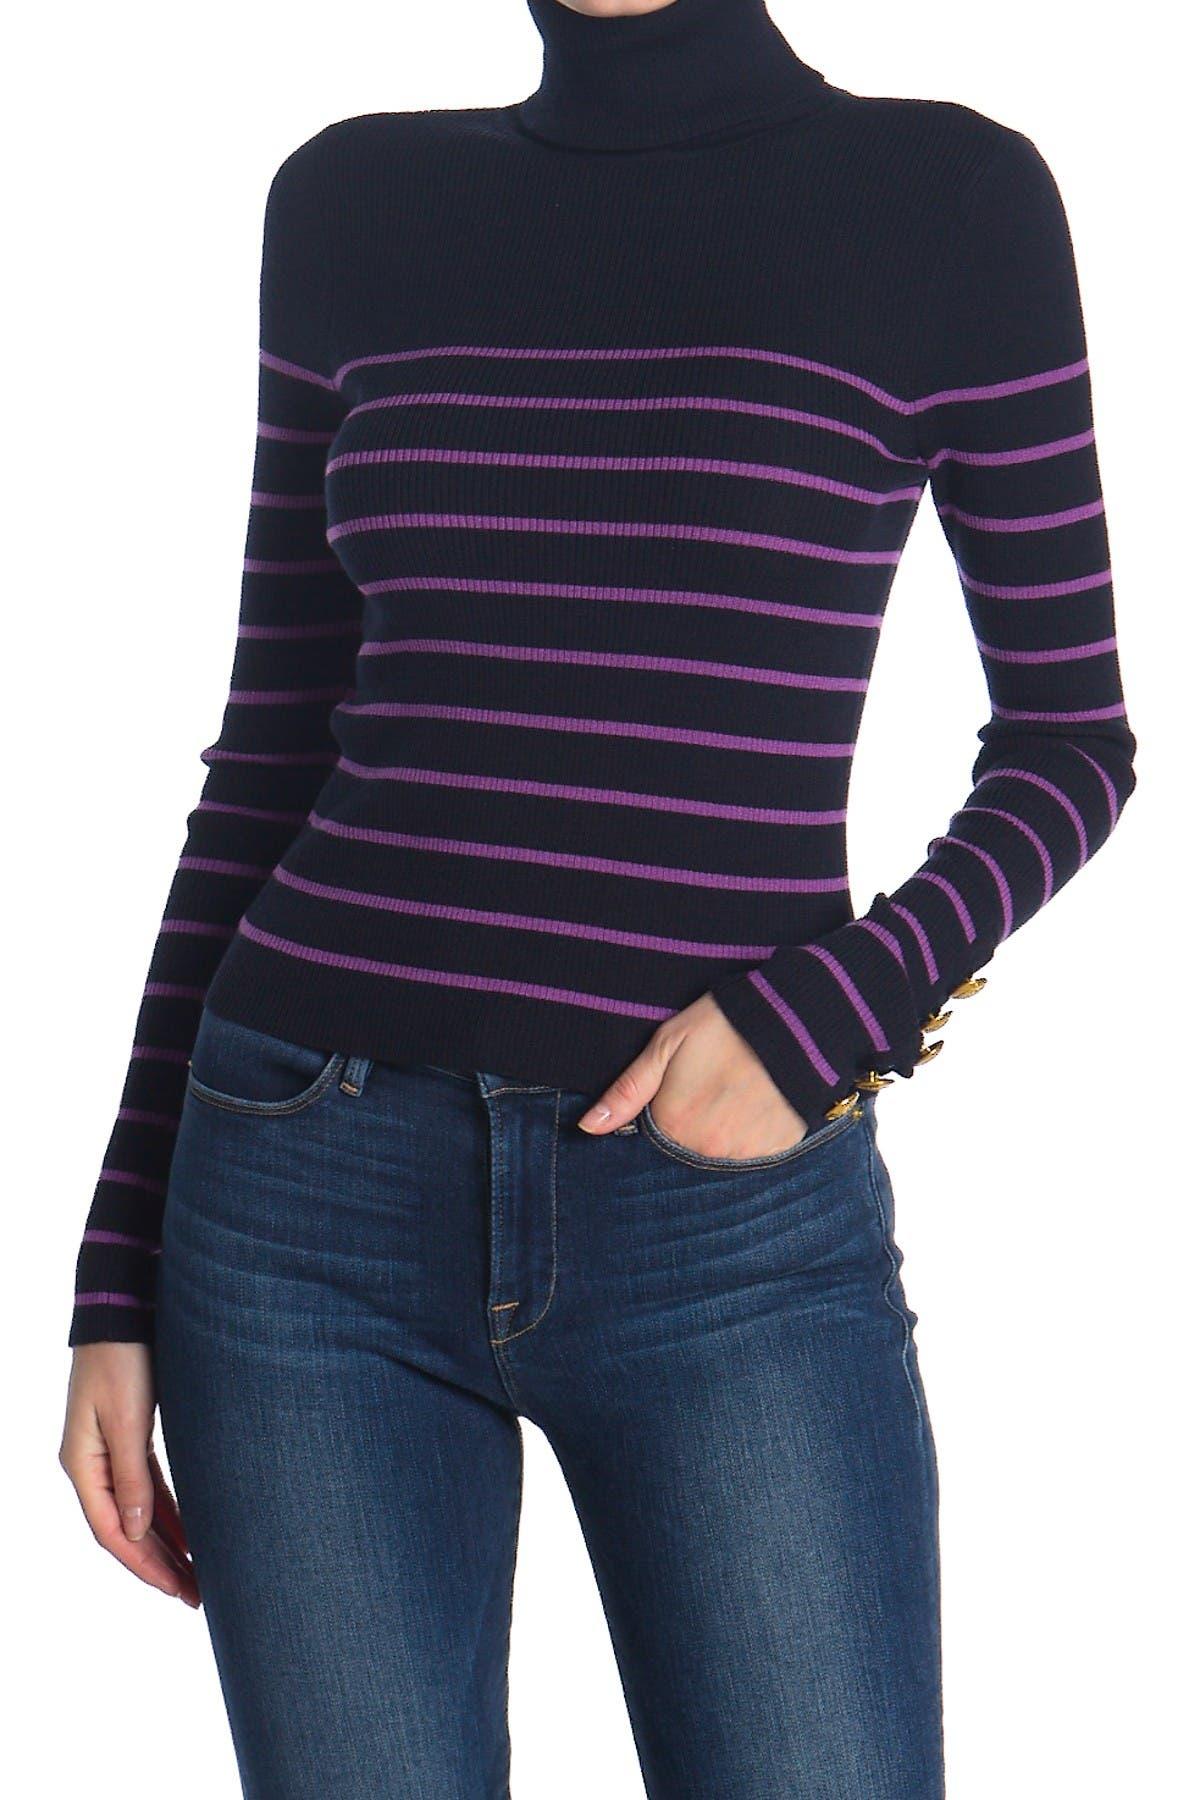 Image of A.L.C. Desi Striped Turtleneck Wool Blend Sweater